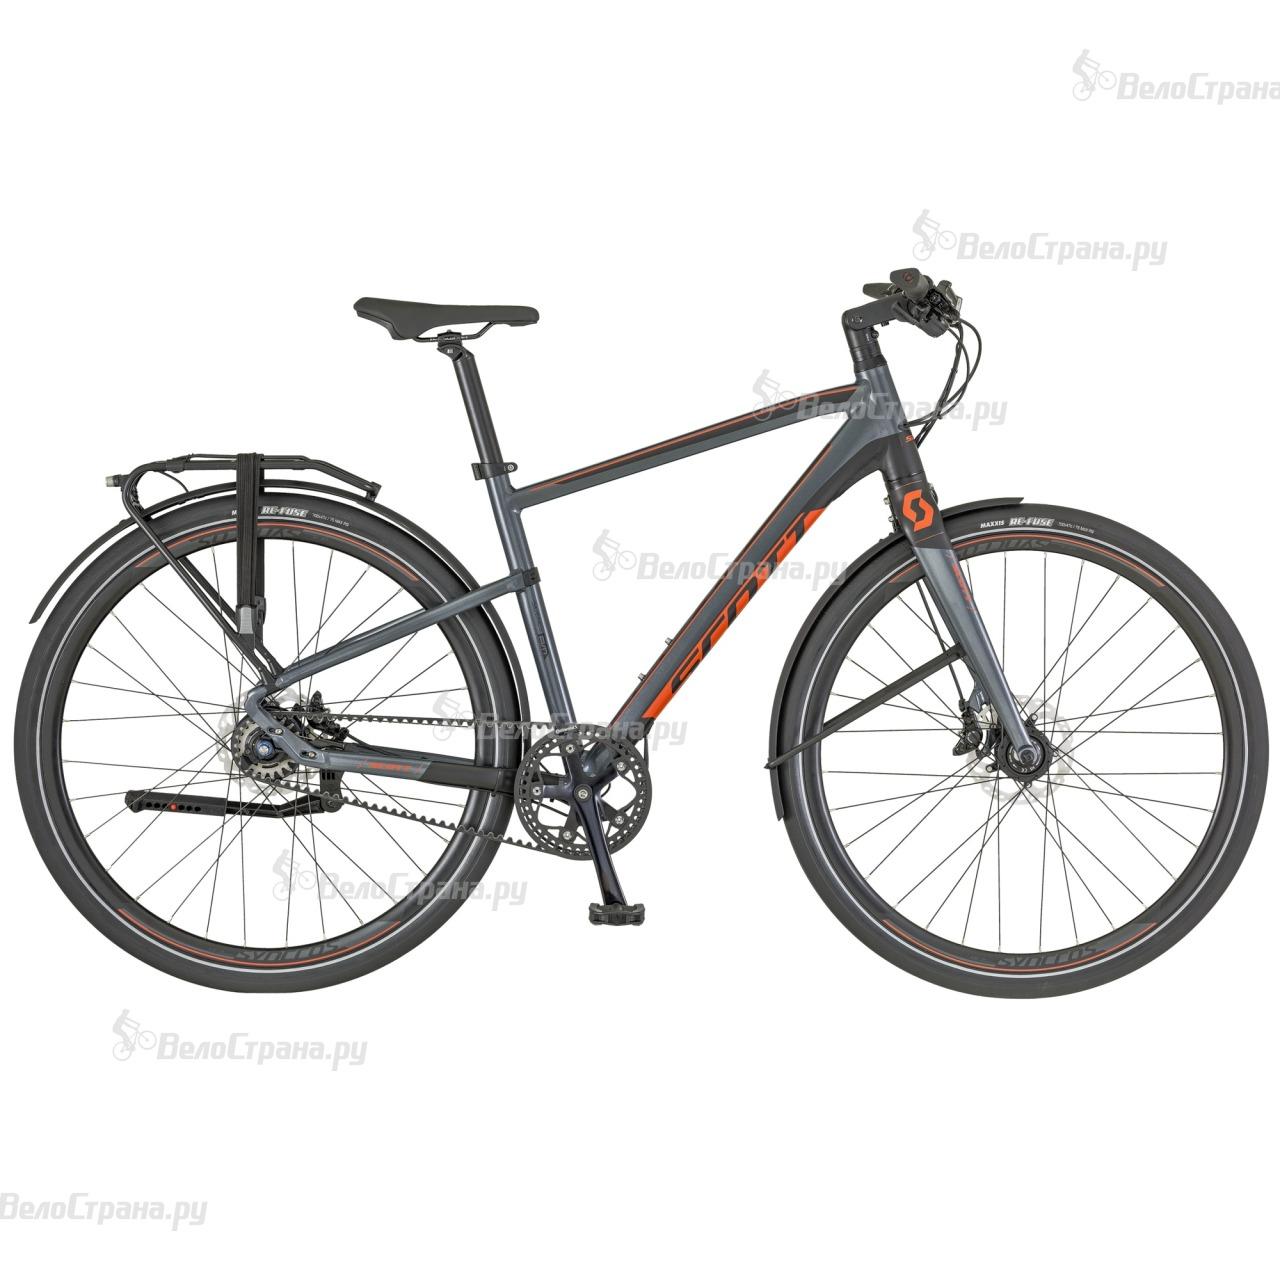 Велосипед Scott Silence Evo (2018) велосипед scott e silence speed 20 2017